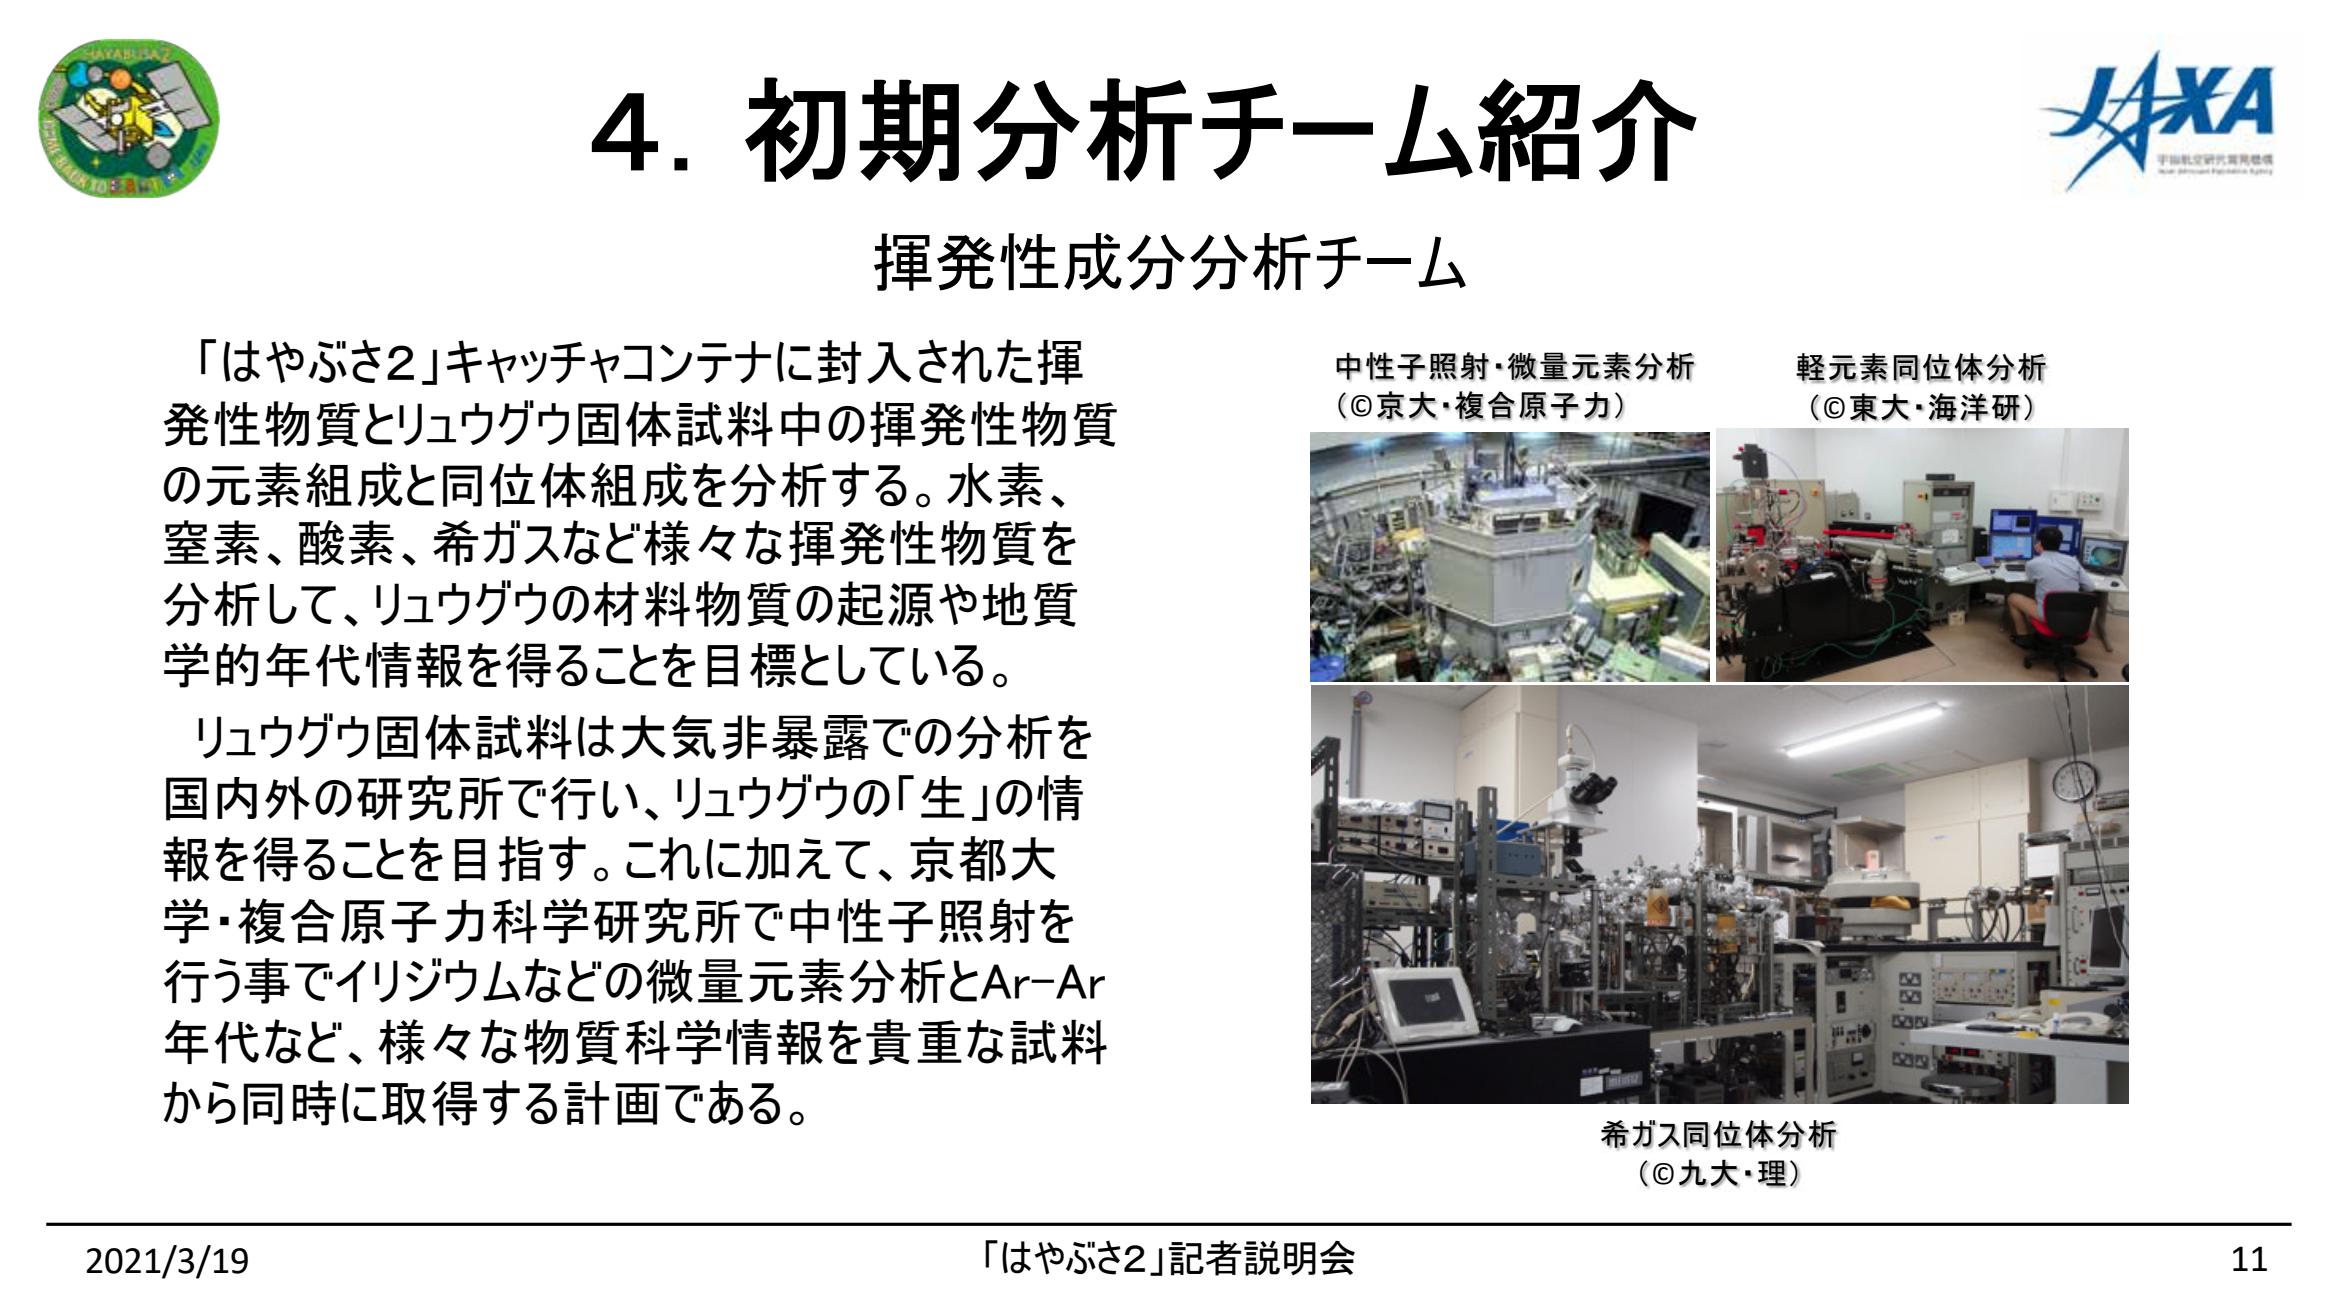 f:id:Imamura:20210319144503p:image